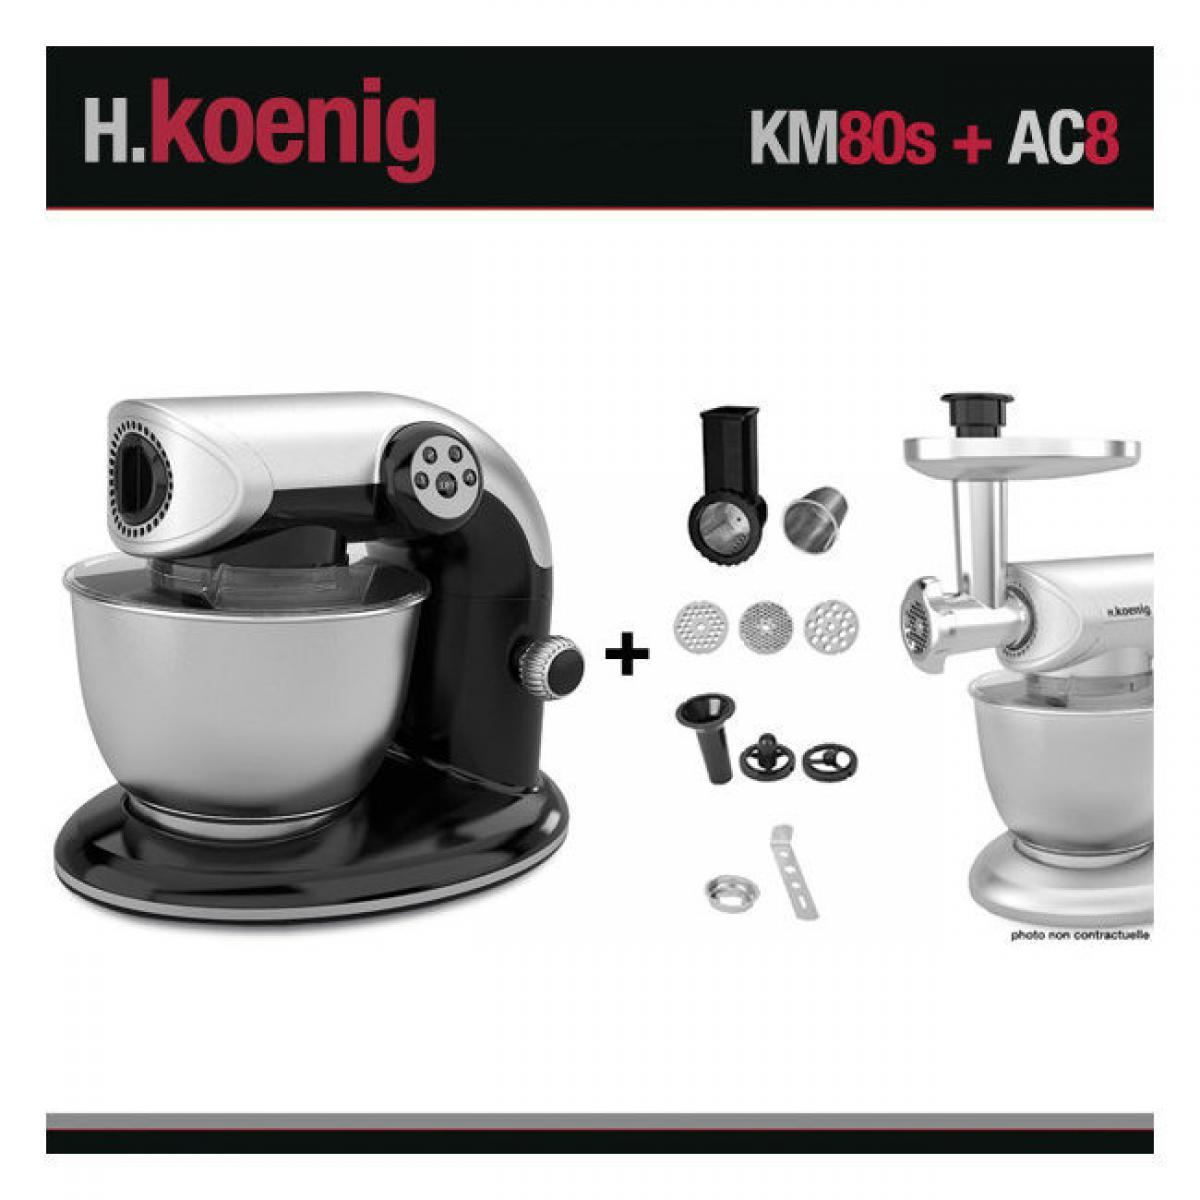 Hkoenig HKOENIG KM80 S NOIR + AC8 : ROBOT PETRIN 1000W+ ACCESSOIRES OPTIONNELS